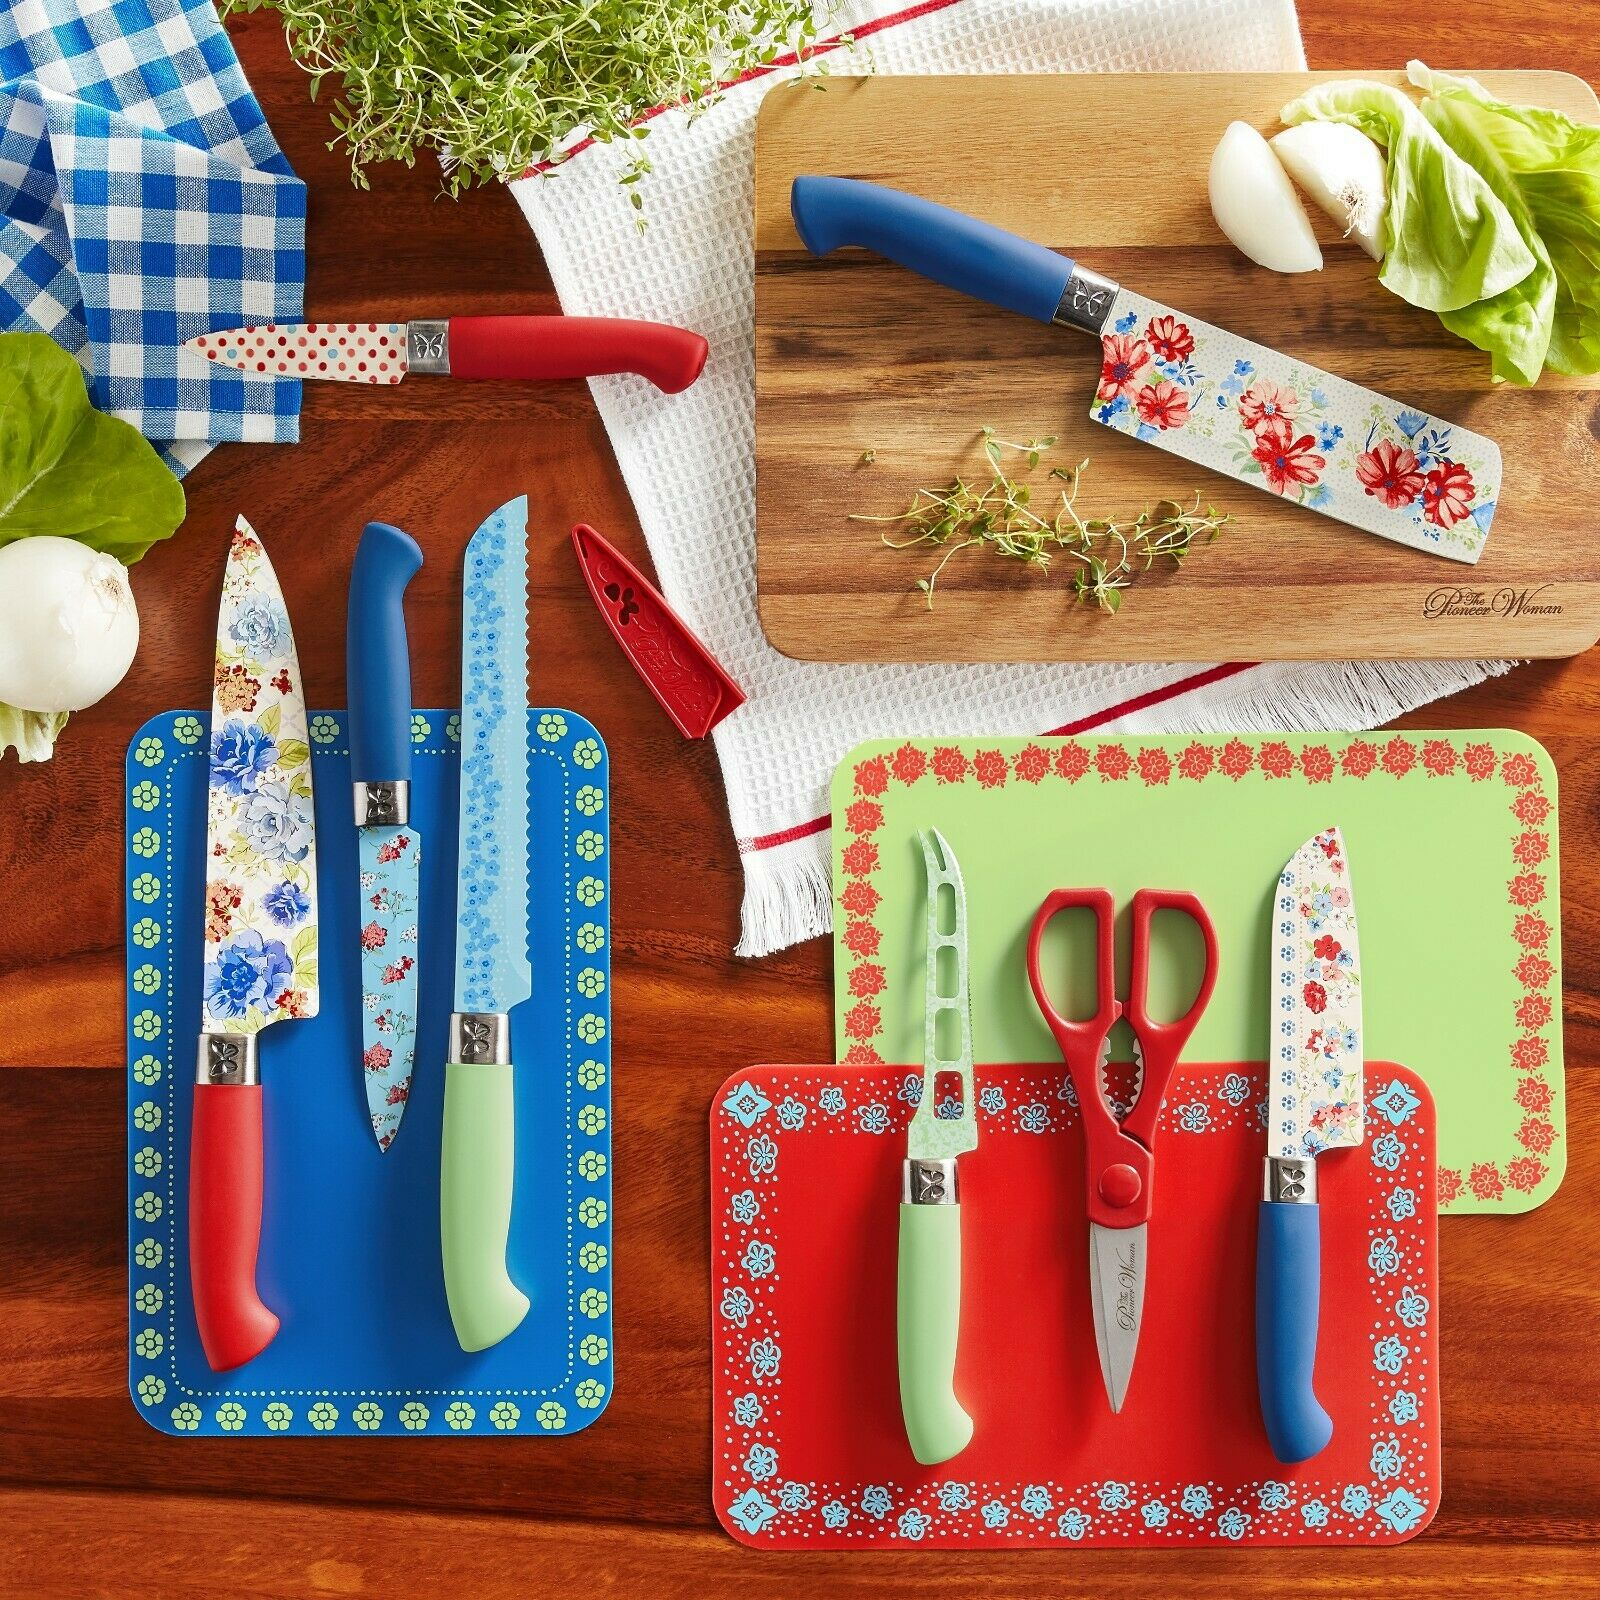 Kitchen Dining Bar The Pioneer Woman Dazzling Dahlias 20 Piece Gadget Set Home Garden Mod Ng